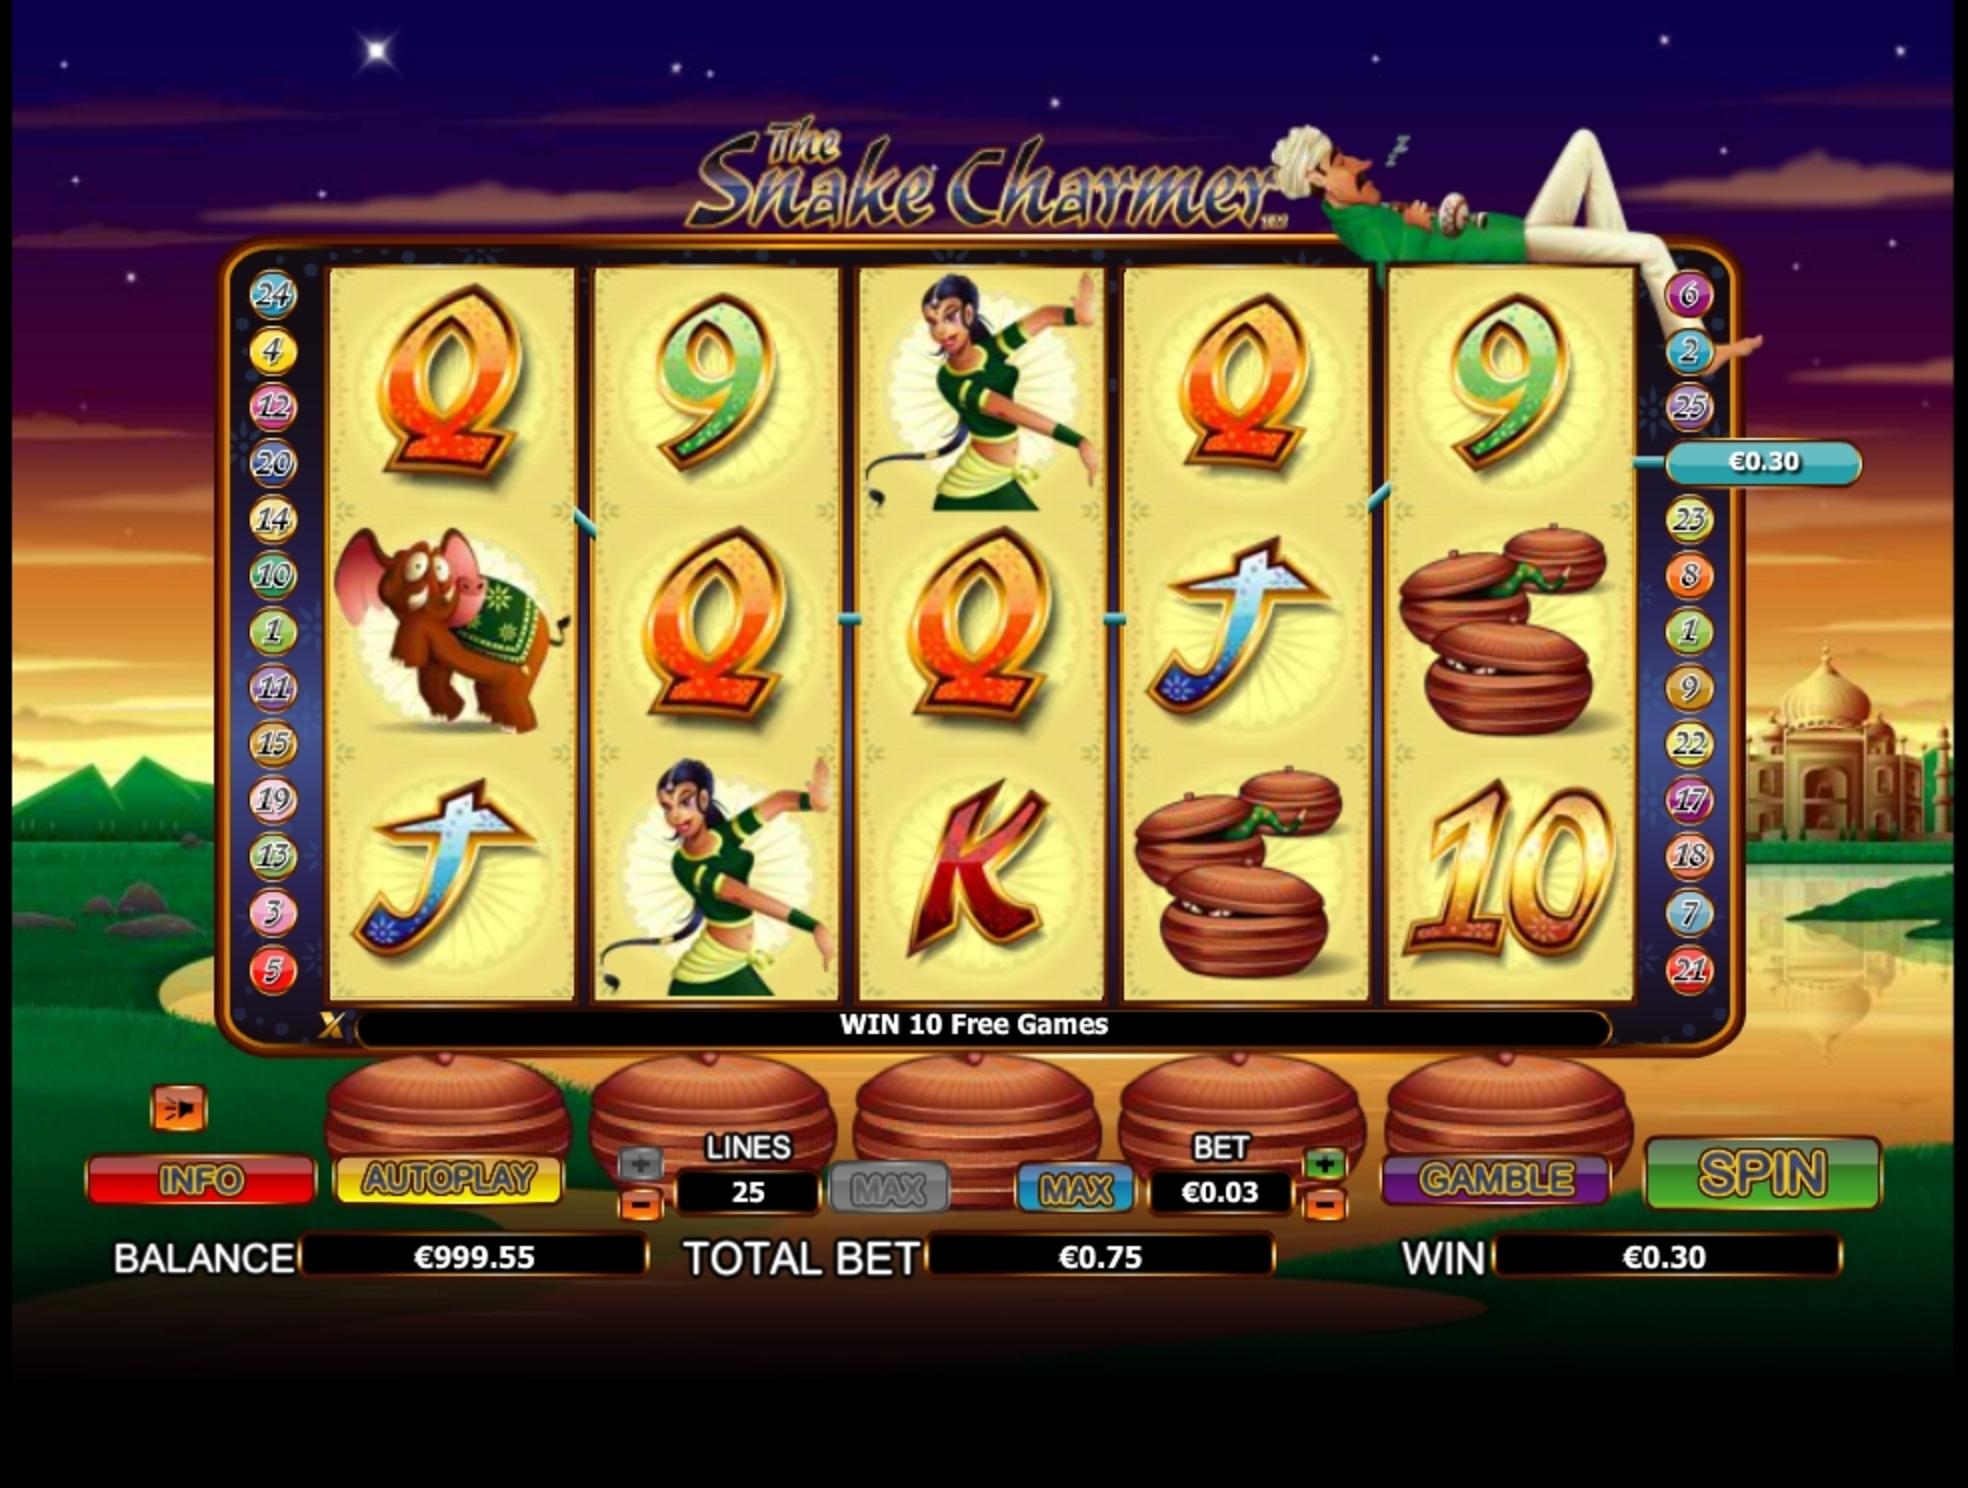 The Snake Charmer Slot Machine